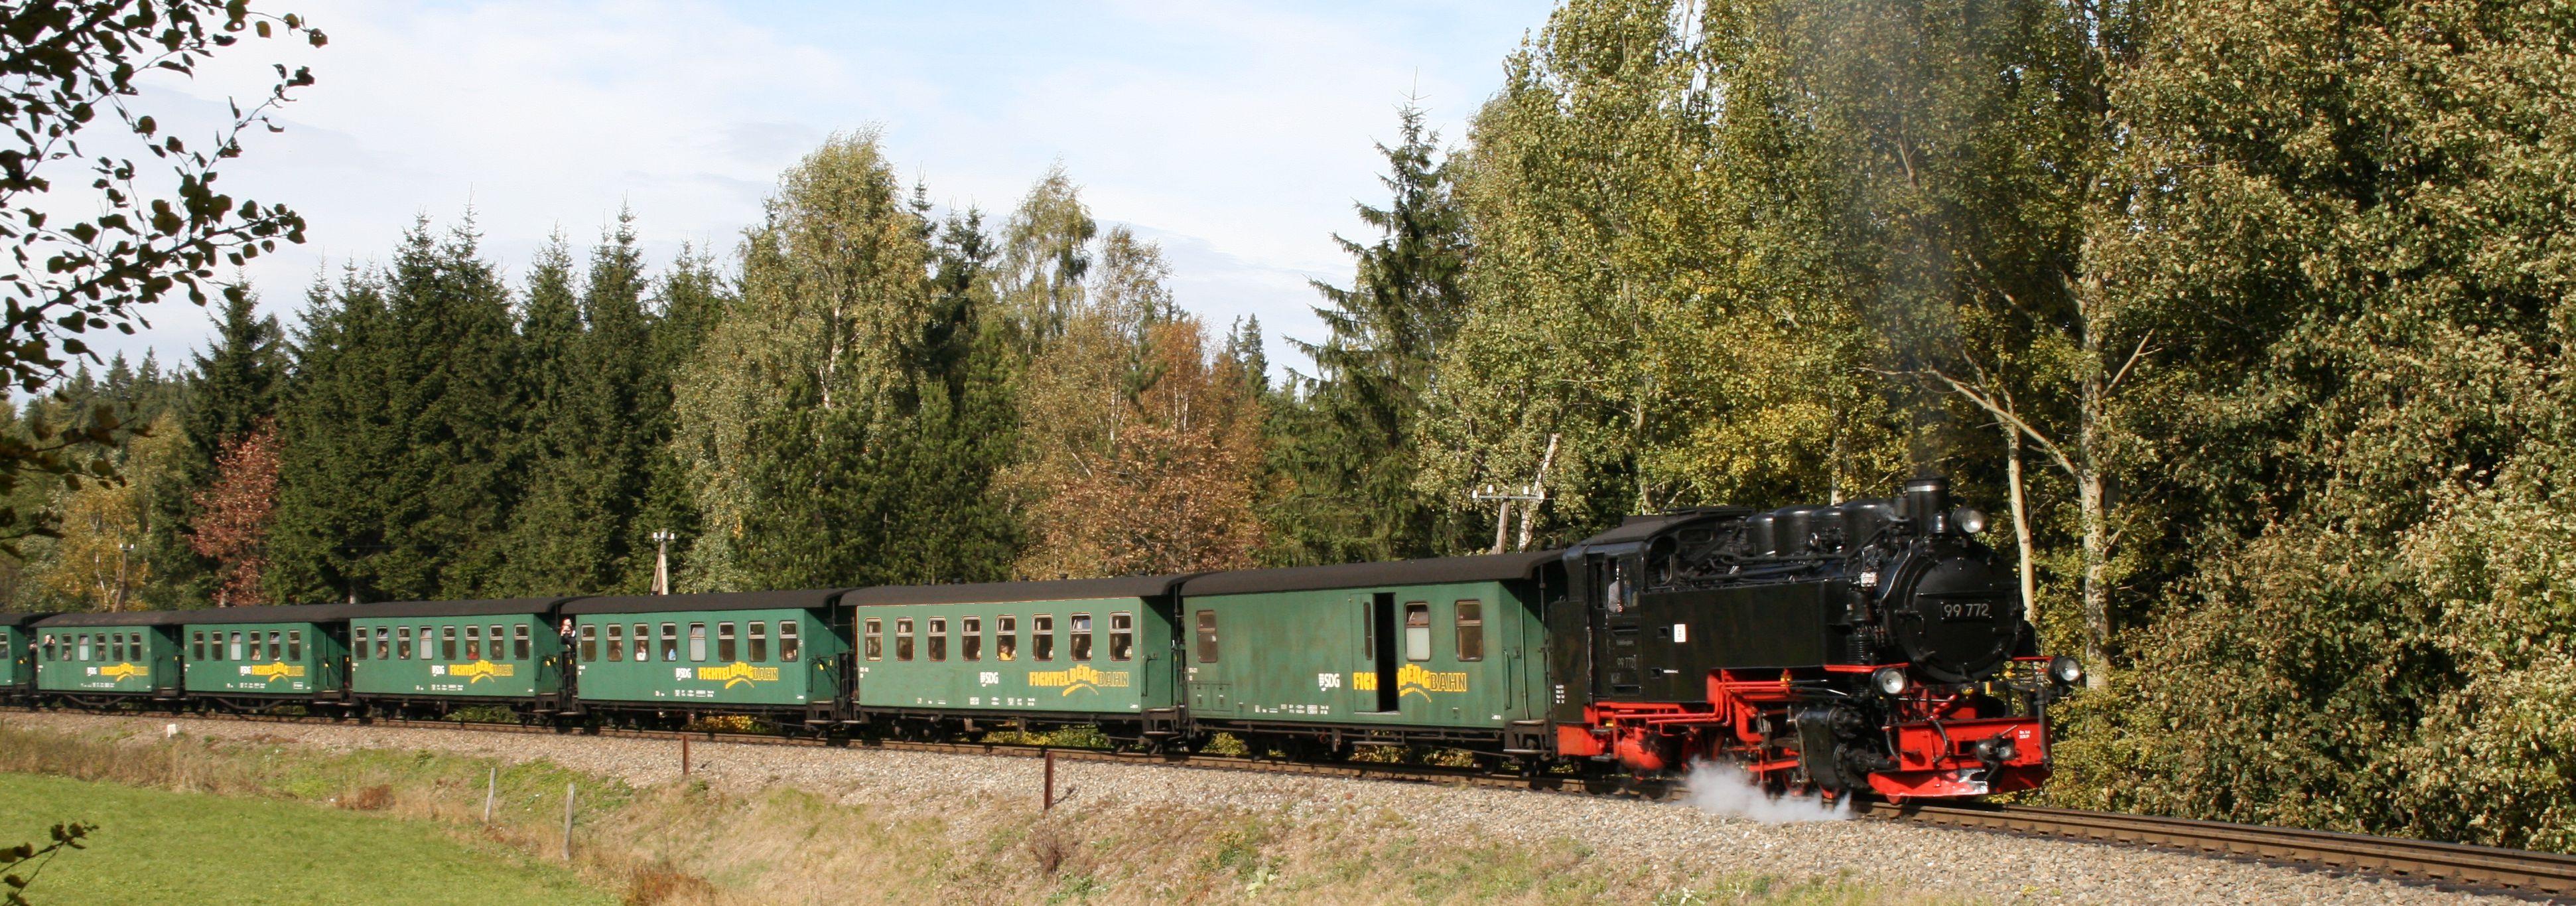 Fichtelbergbahn bei Kretscham Rothensehma